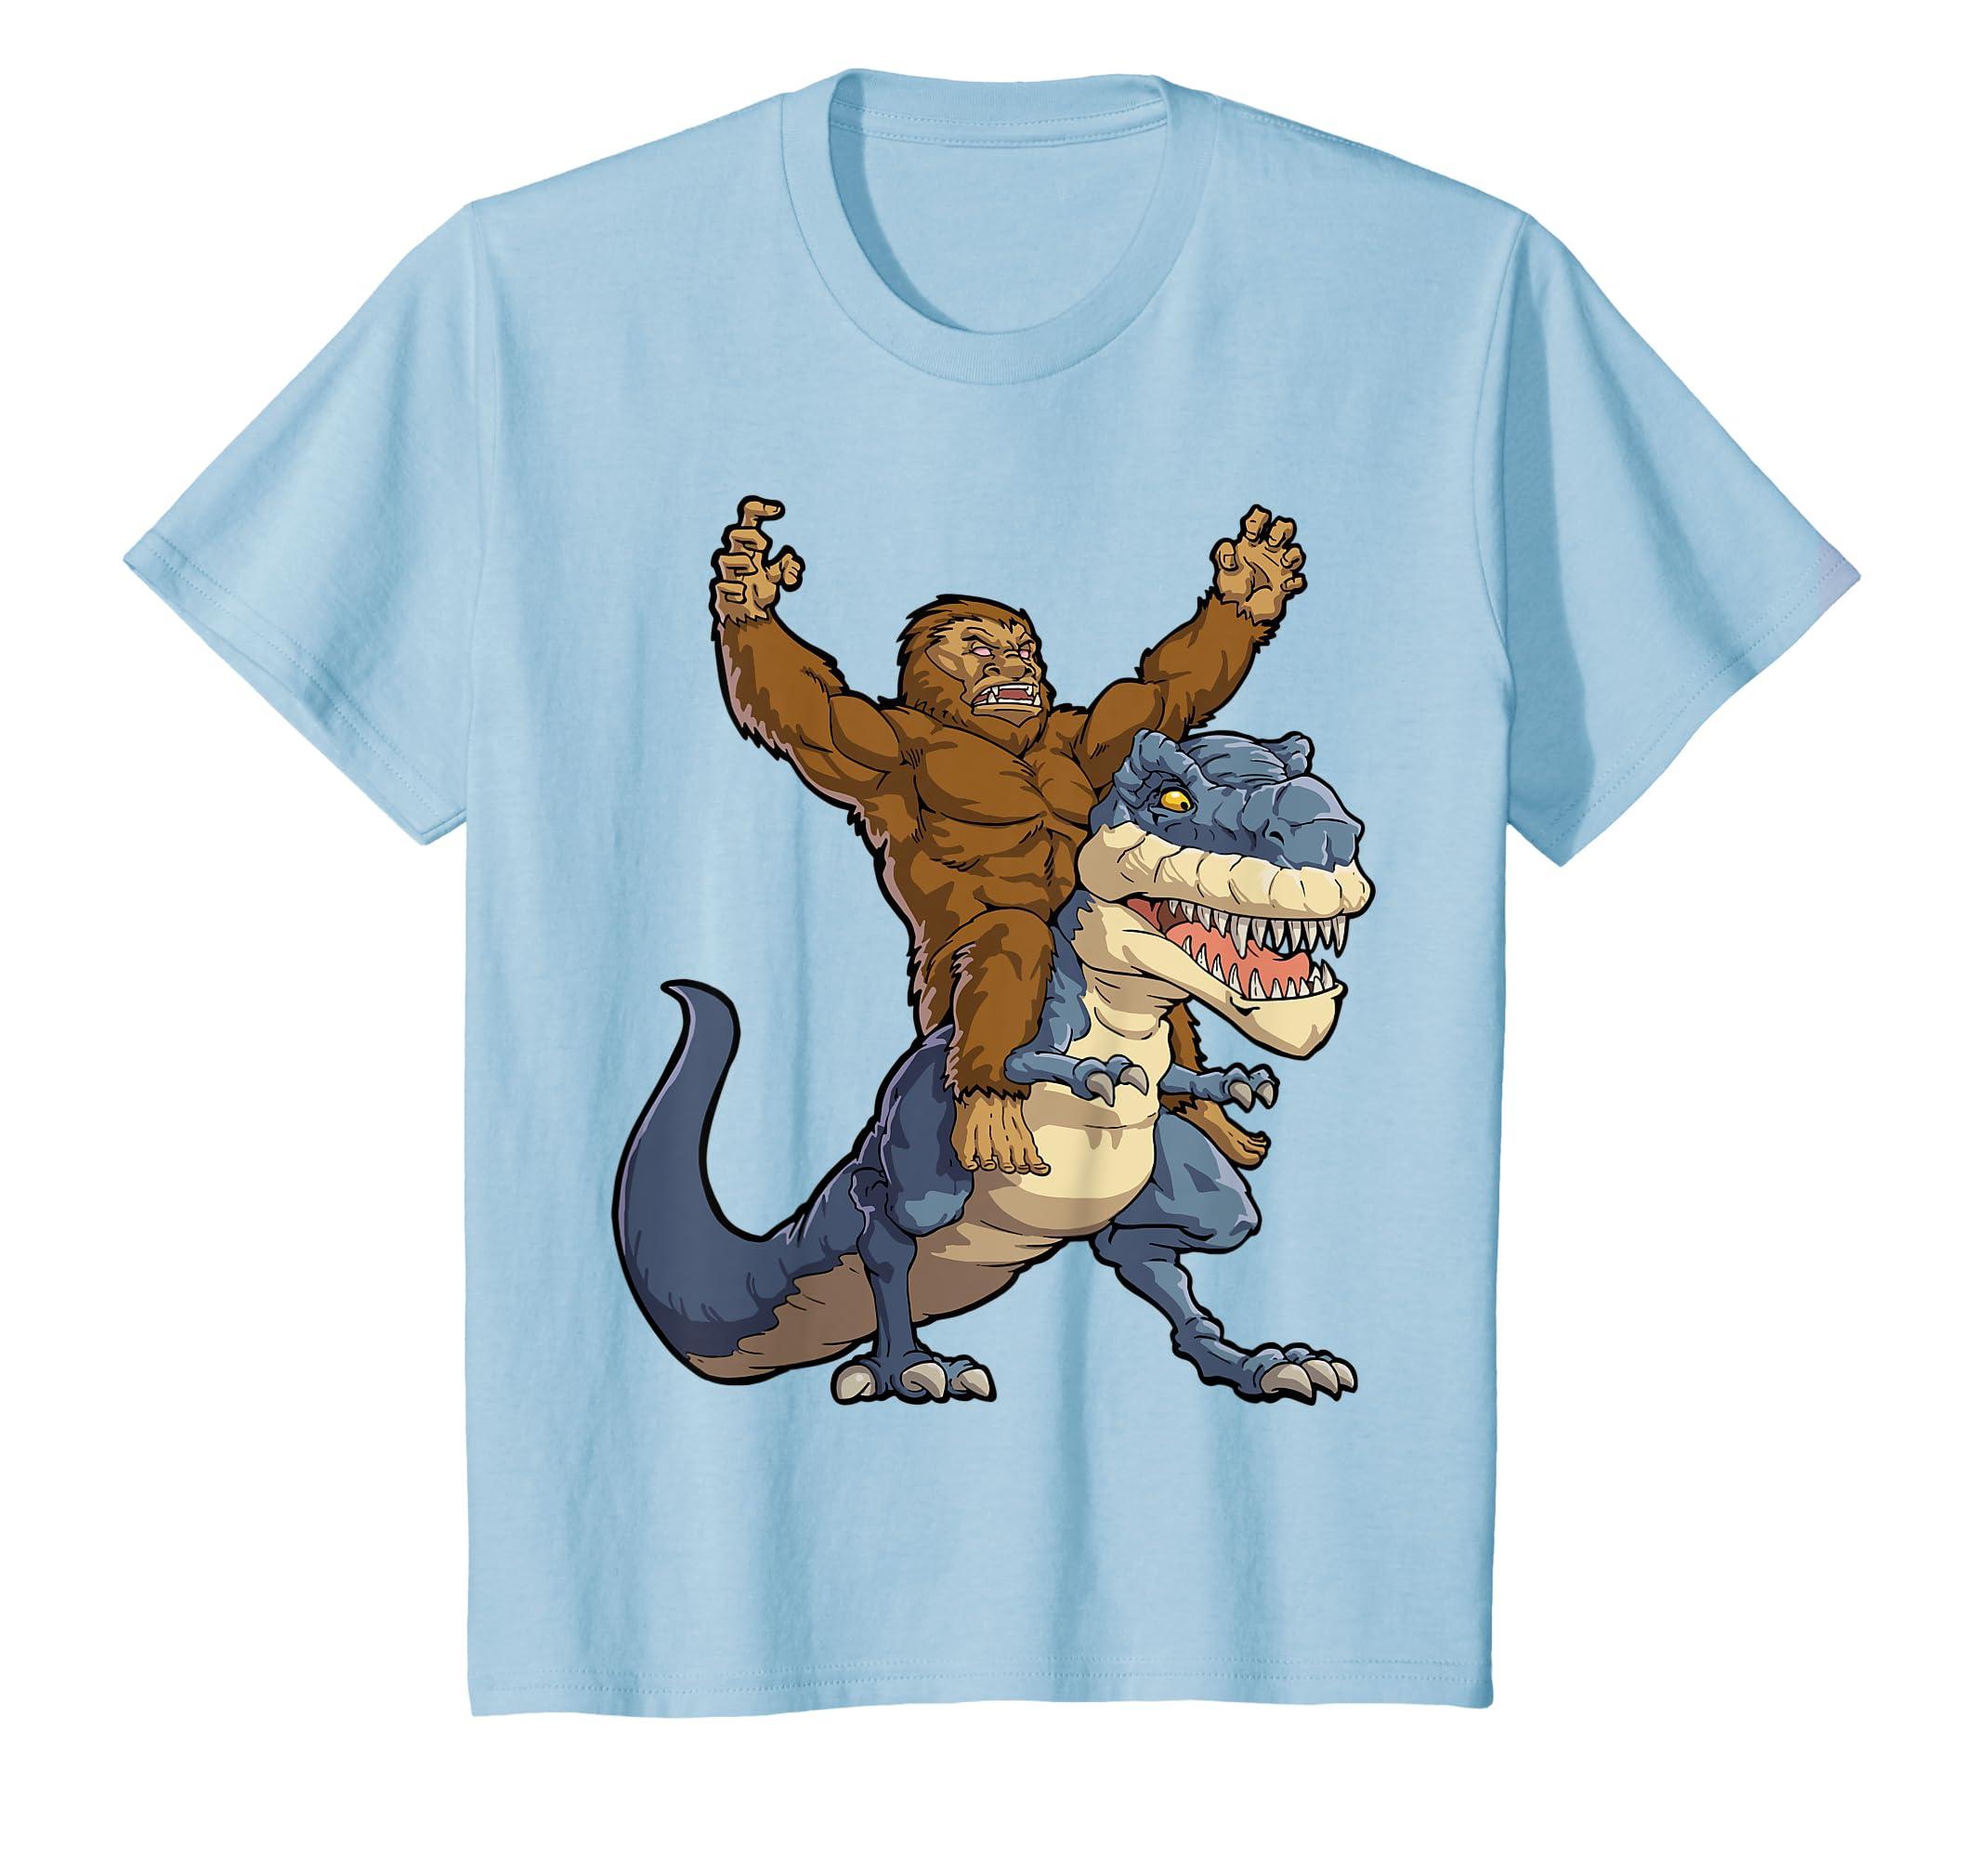 2da0d72d Amazon.com: Bigfoot Sasquatch Riding Dinosaur T rex T shirt Funny Gifts:  Clothing